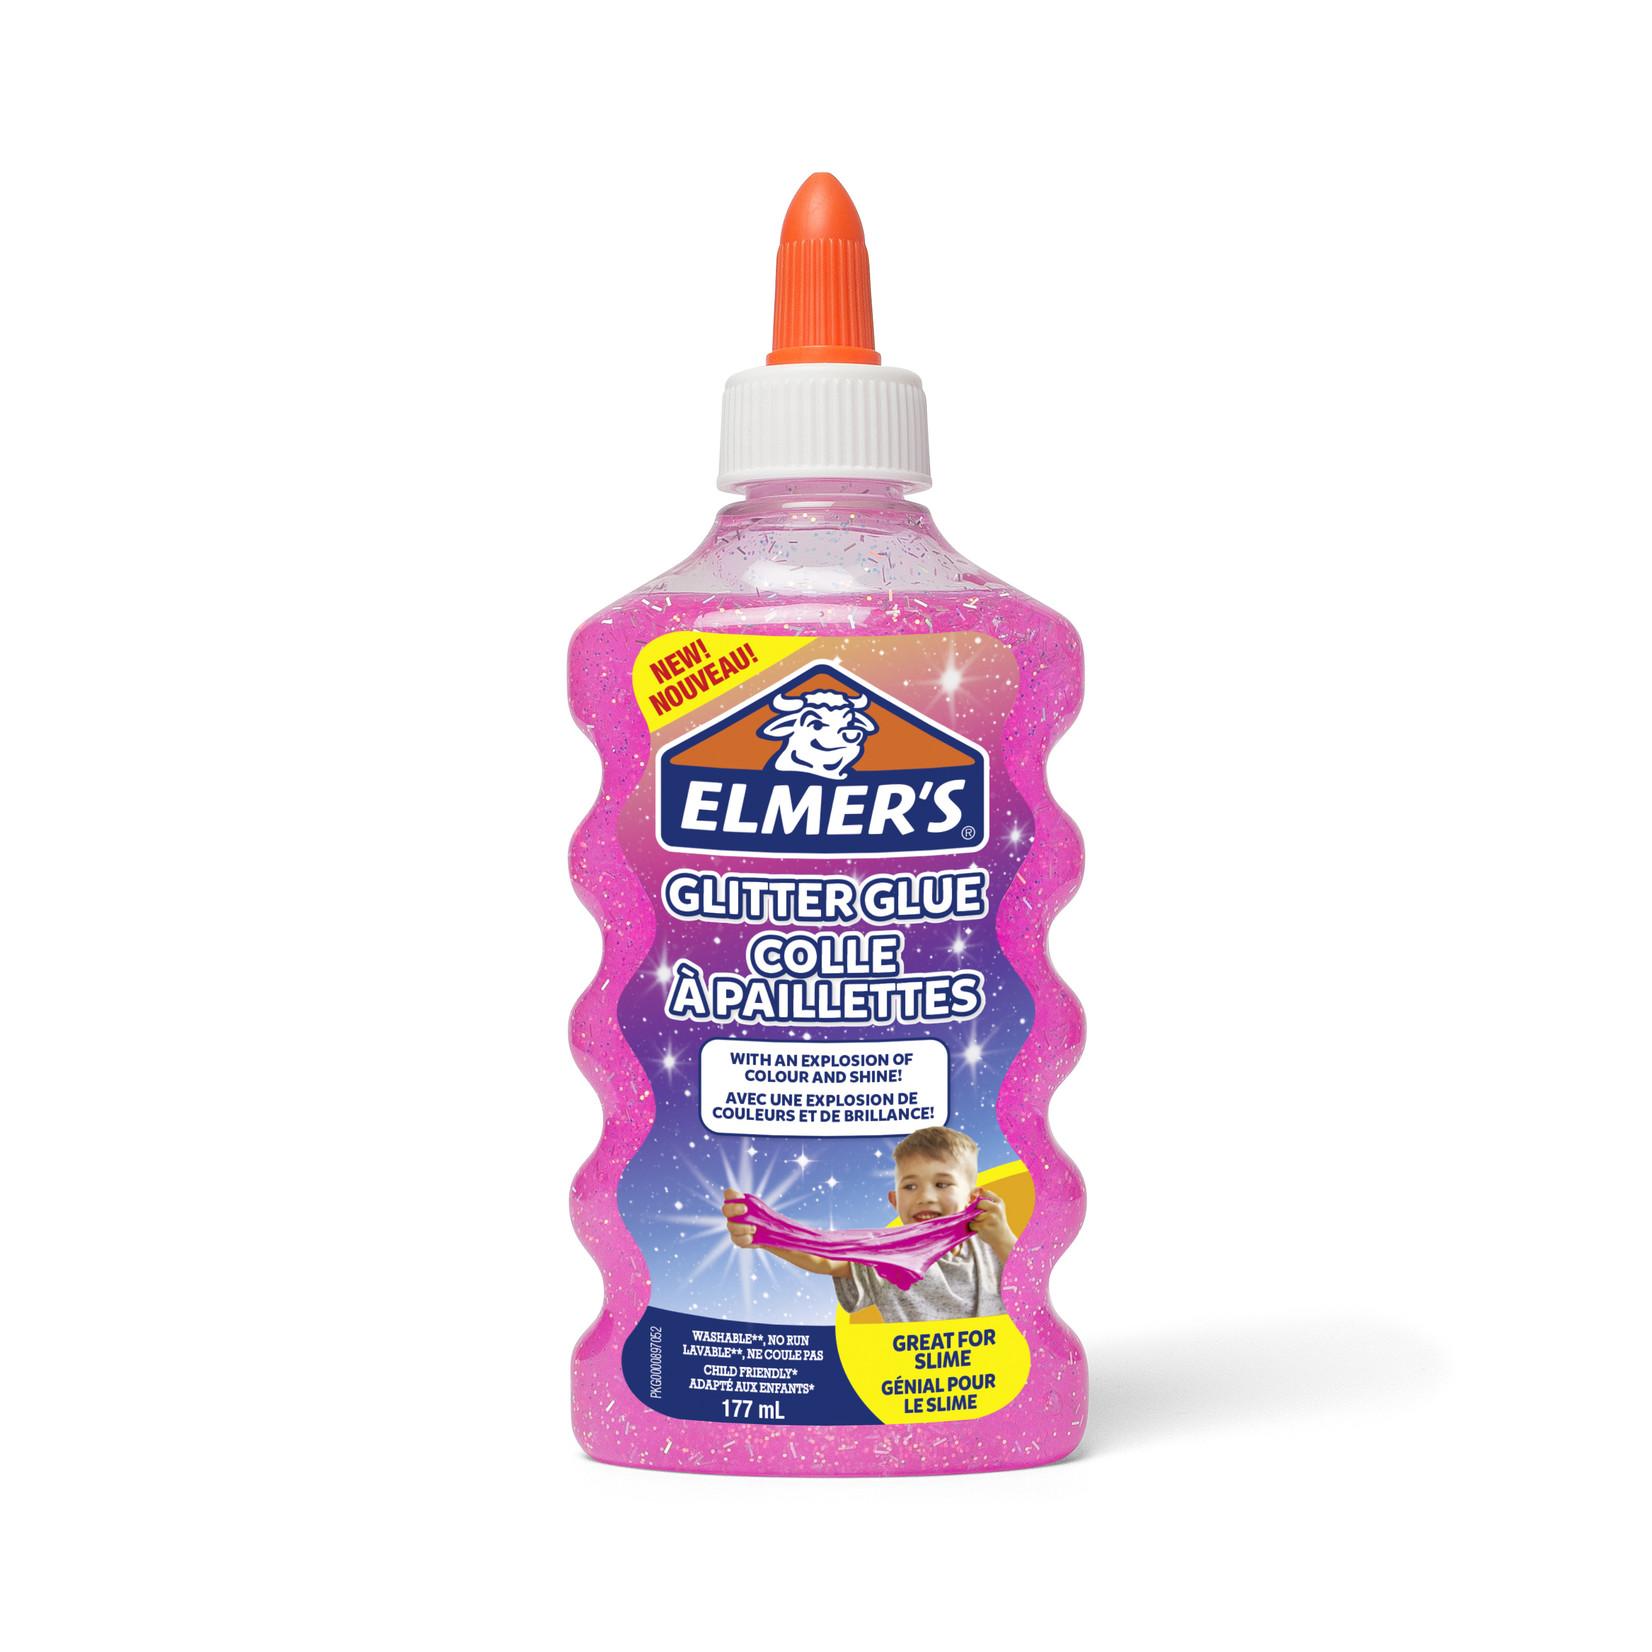 NWL Austria GmbH Elmers Glitter Glue pink